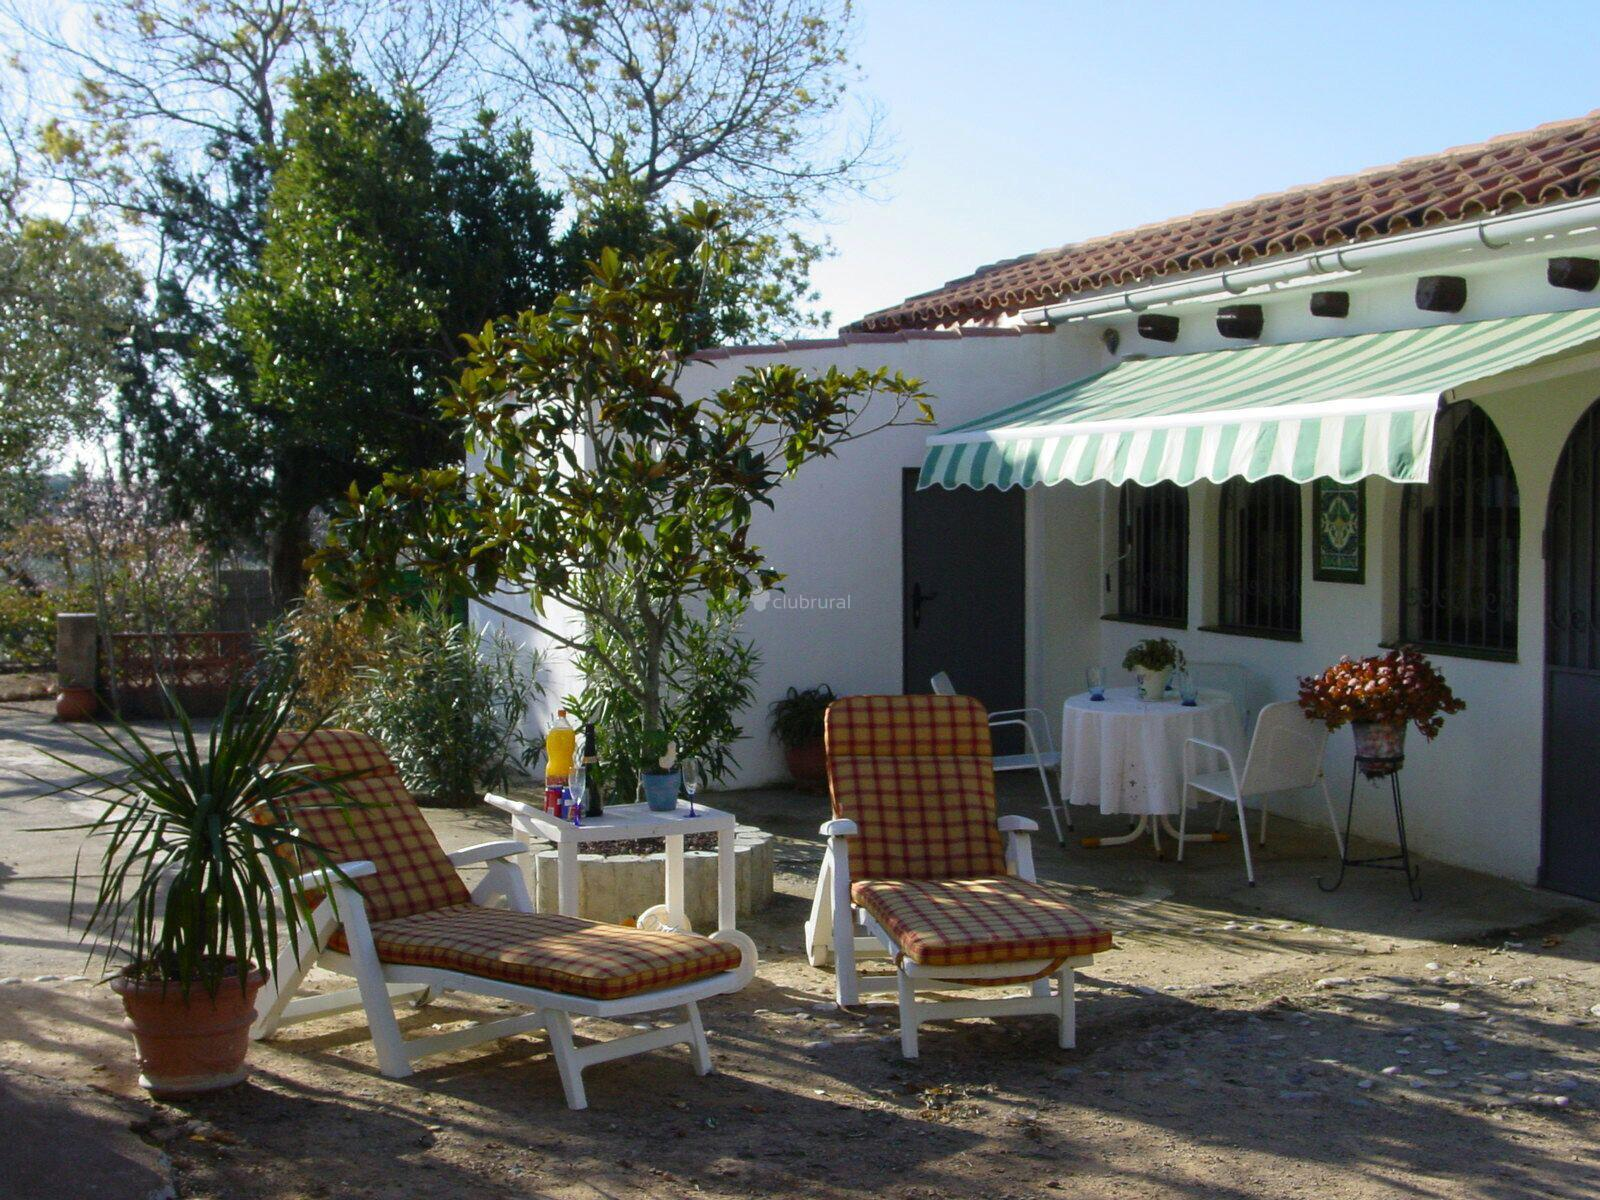 Fotos de can wancho tarragona botarell clubrural for Casa rural tarragona